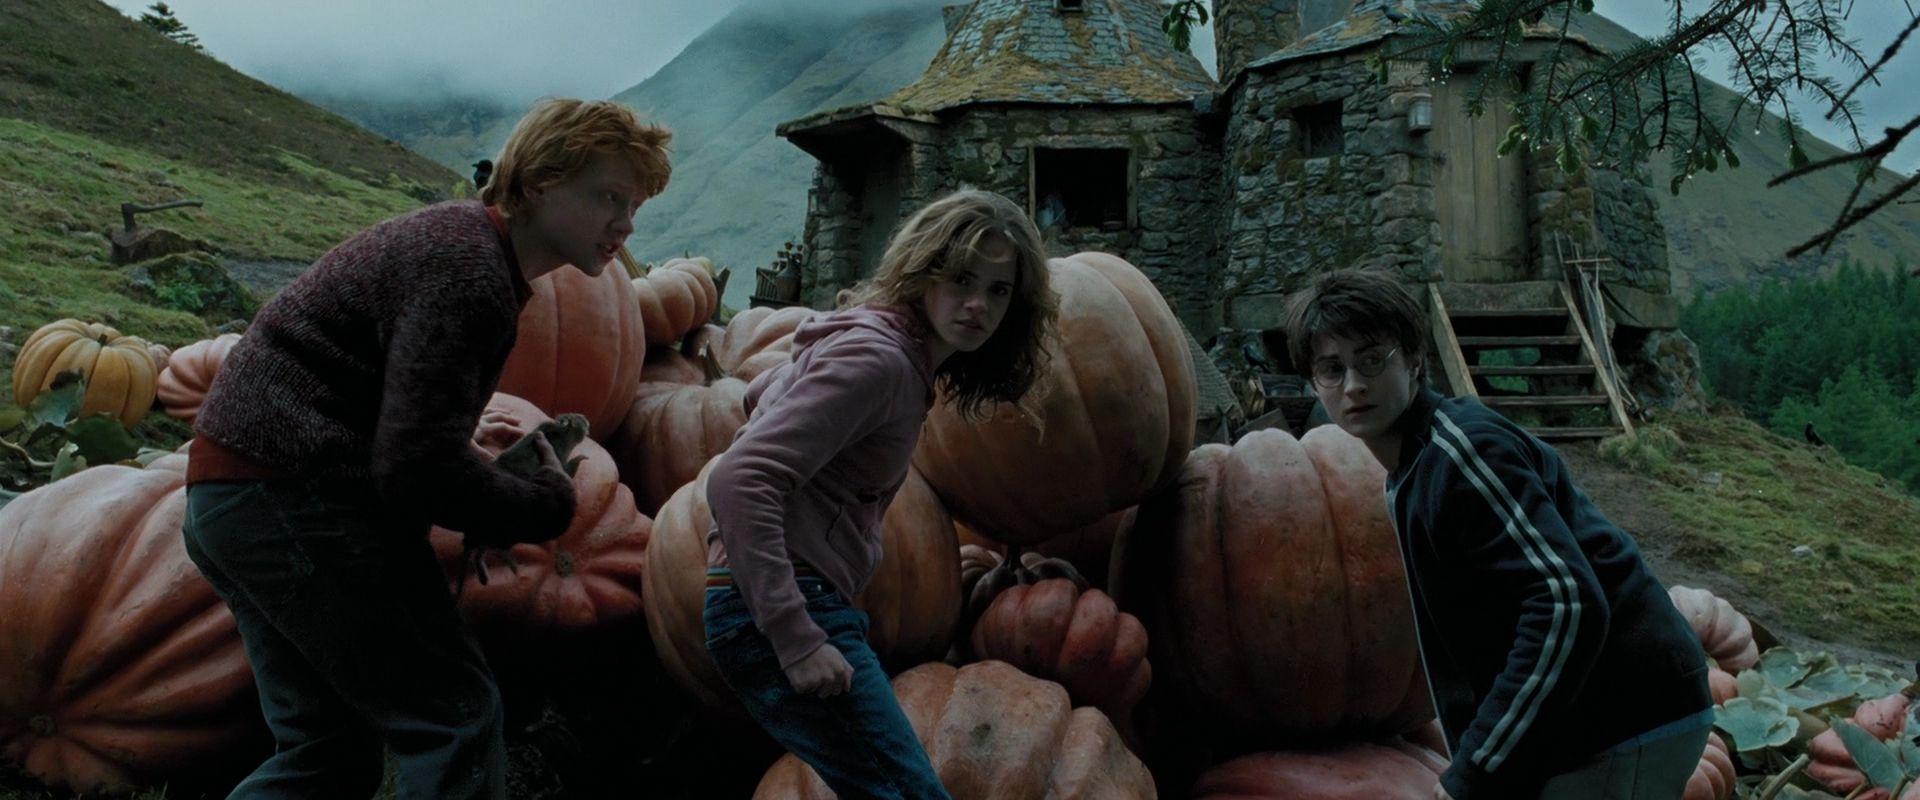 Image result for harry potter and the prisoner of azkaban